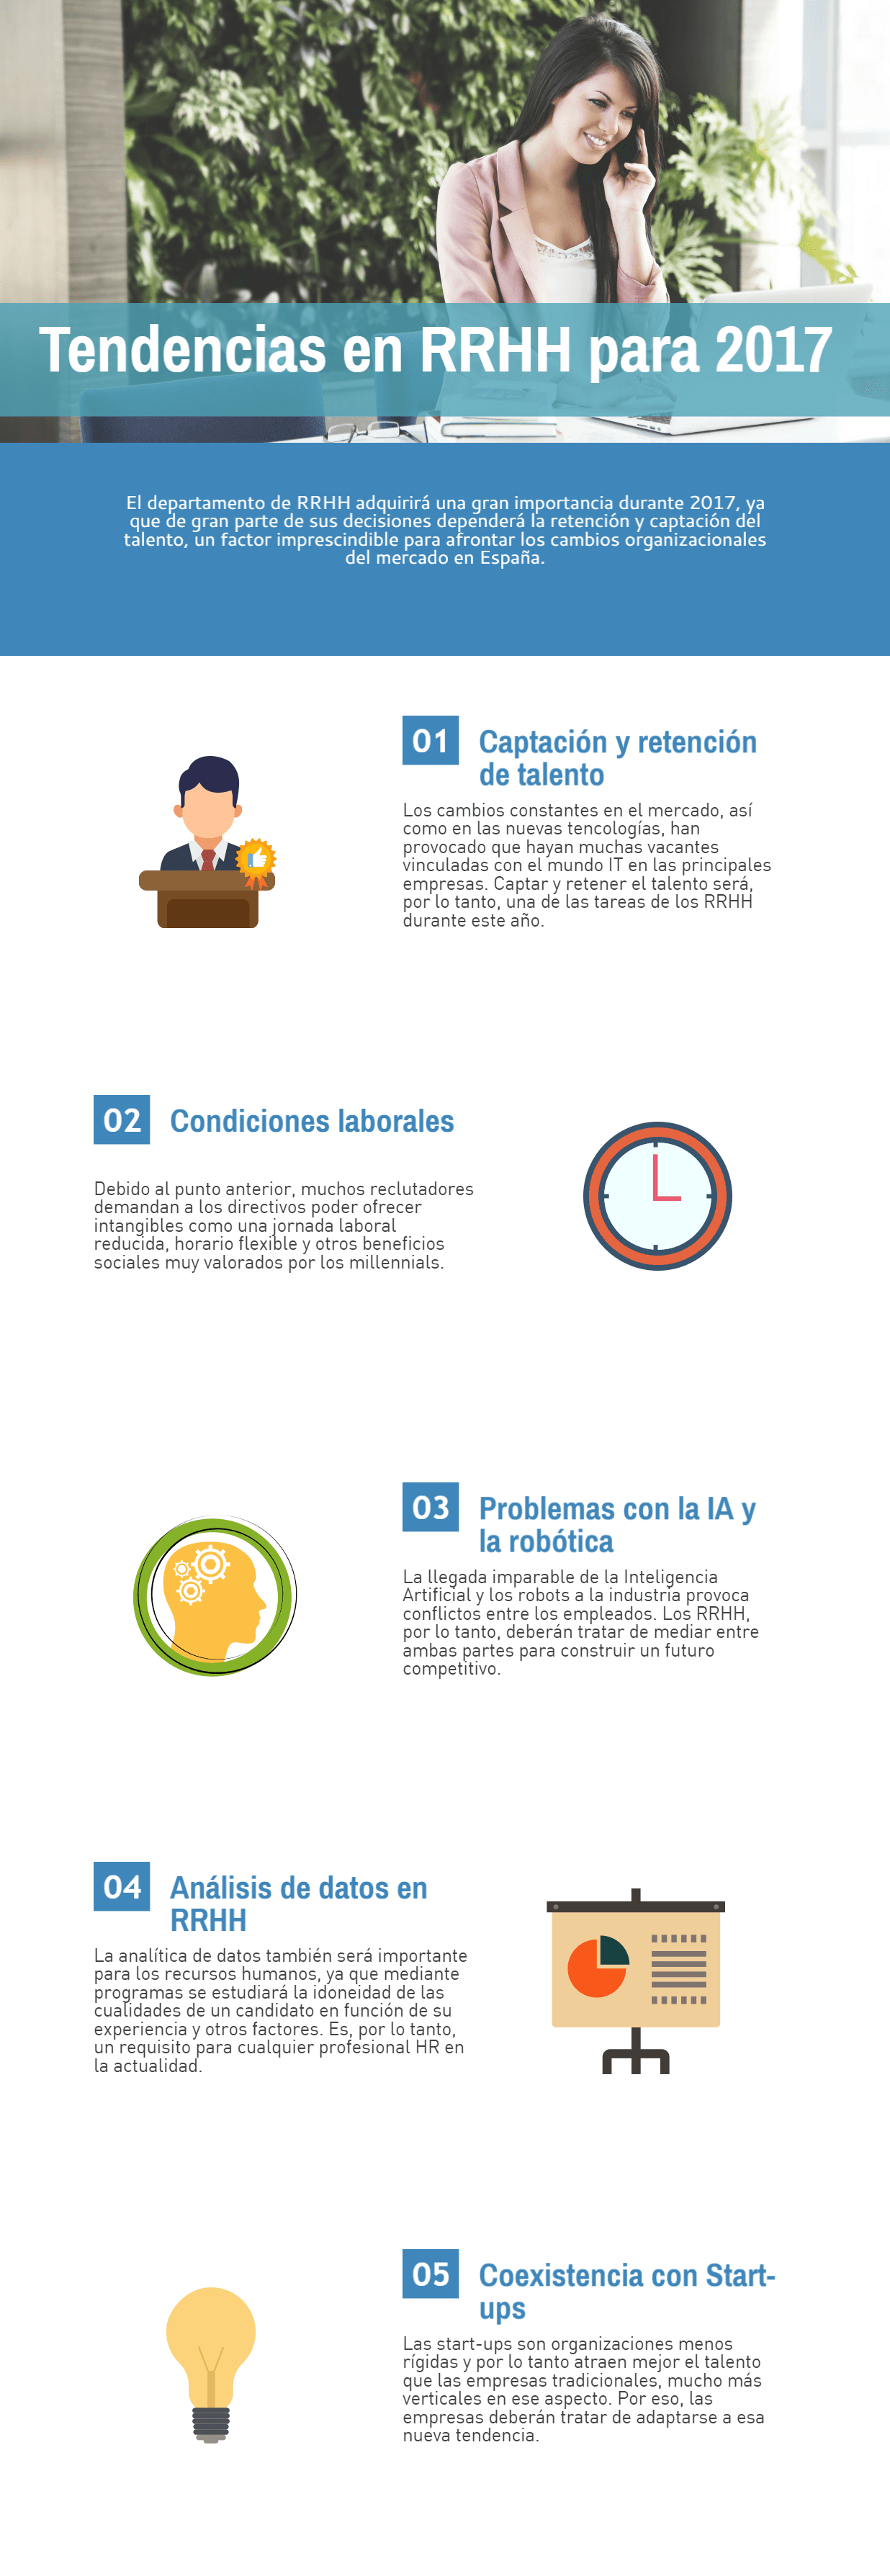 Infografía sobre las tendencias en RRHH para 2017 en España